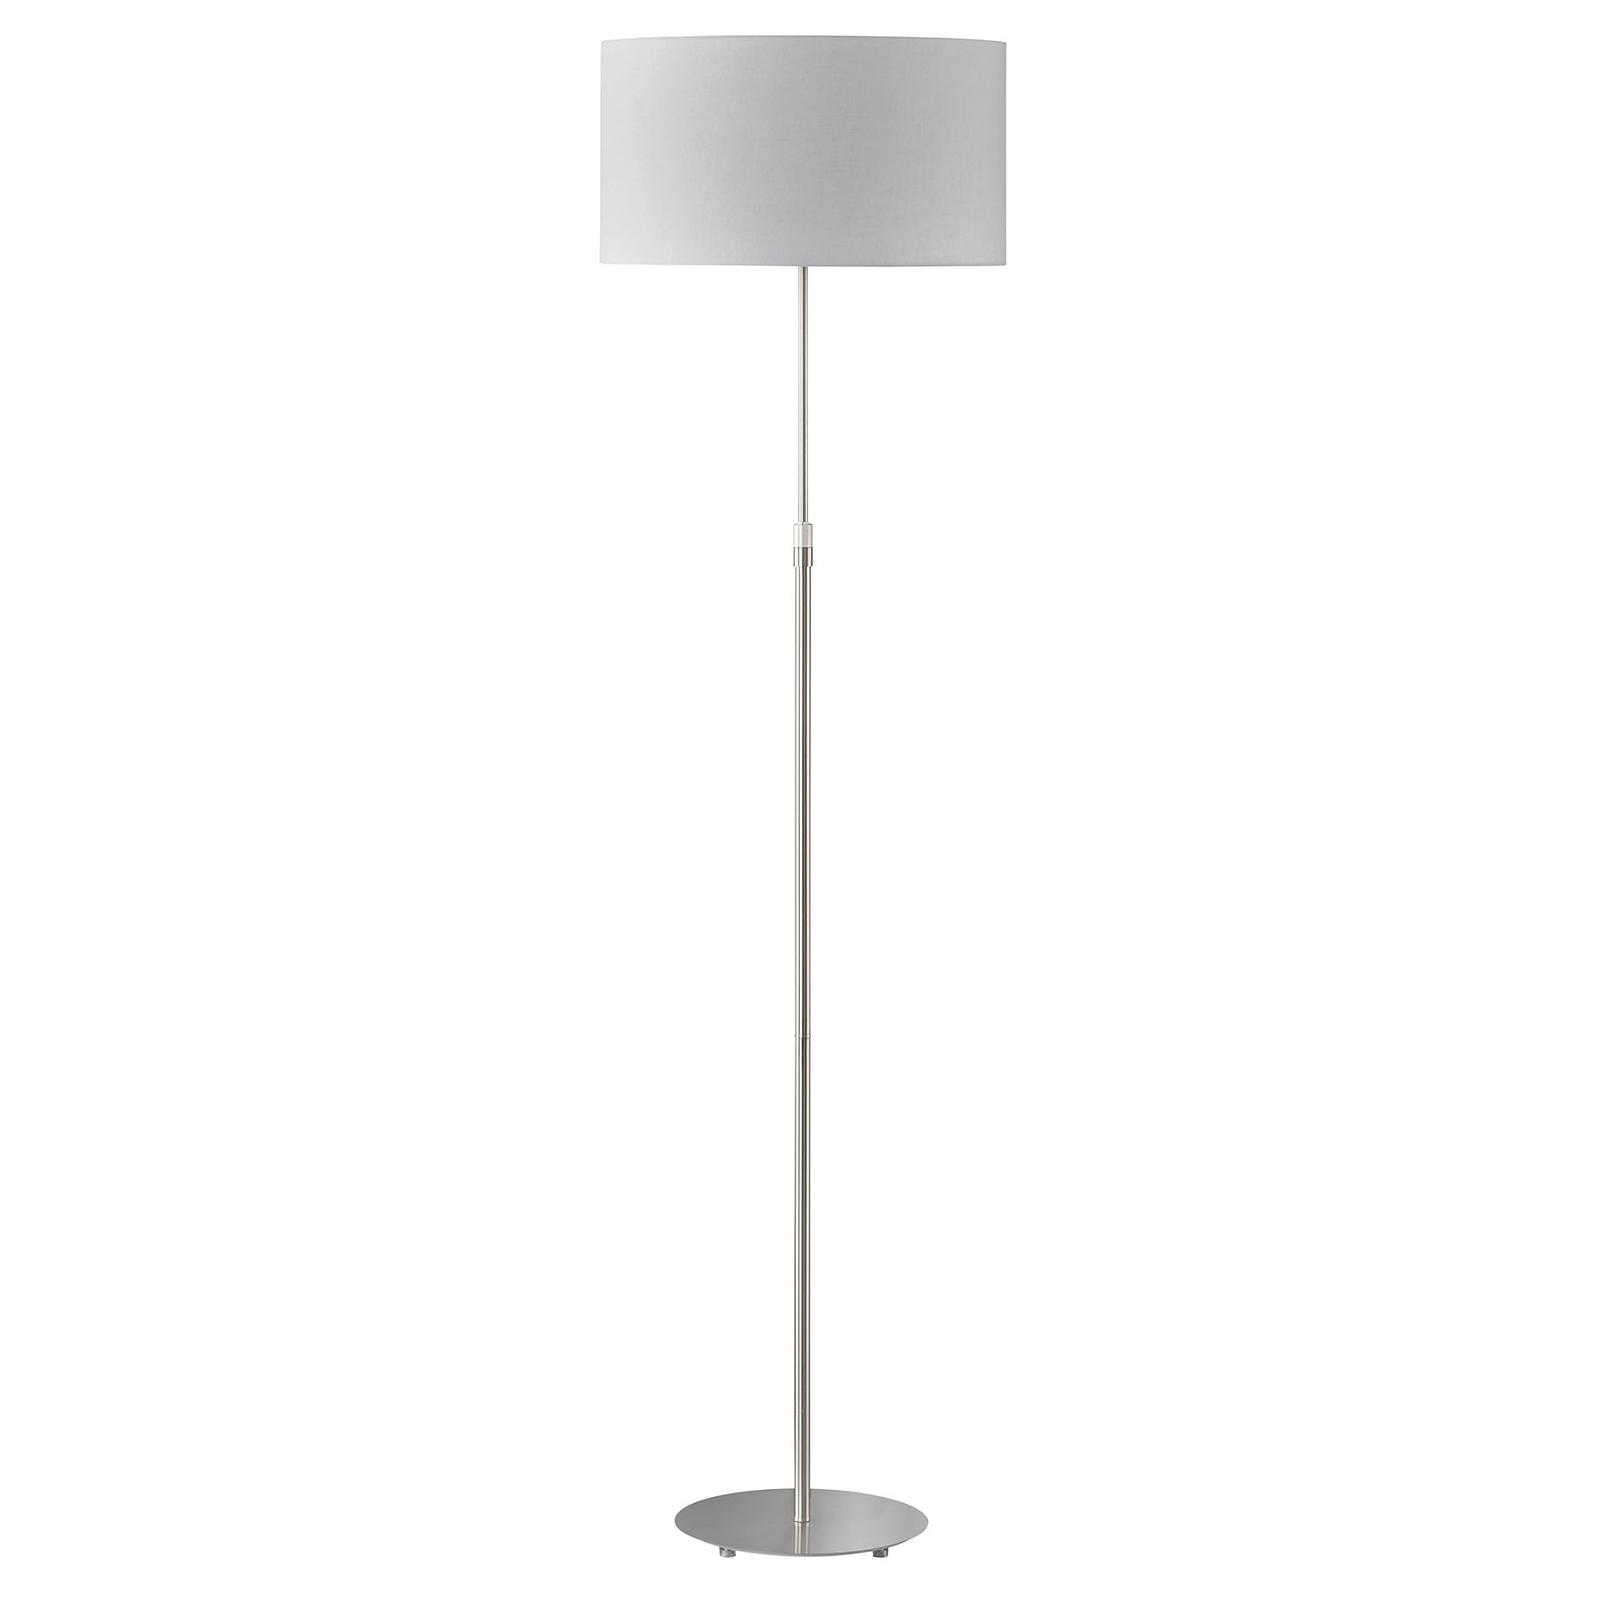 Mooier wonen Pina vloerlamp lichtgrijs